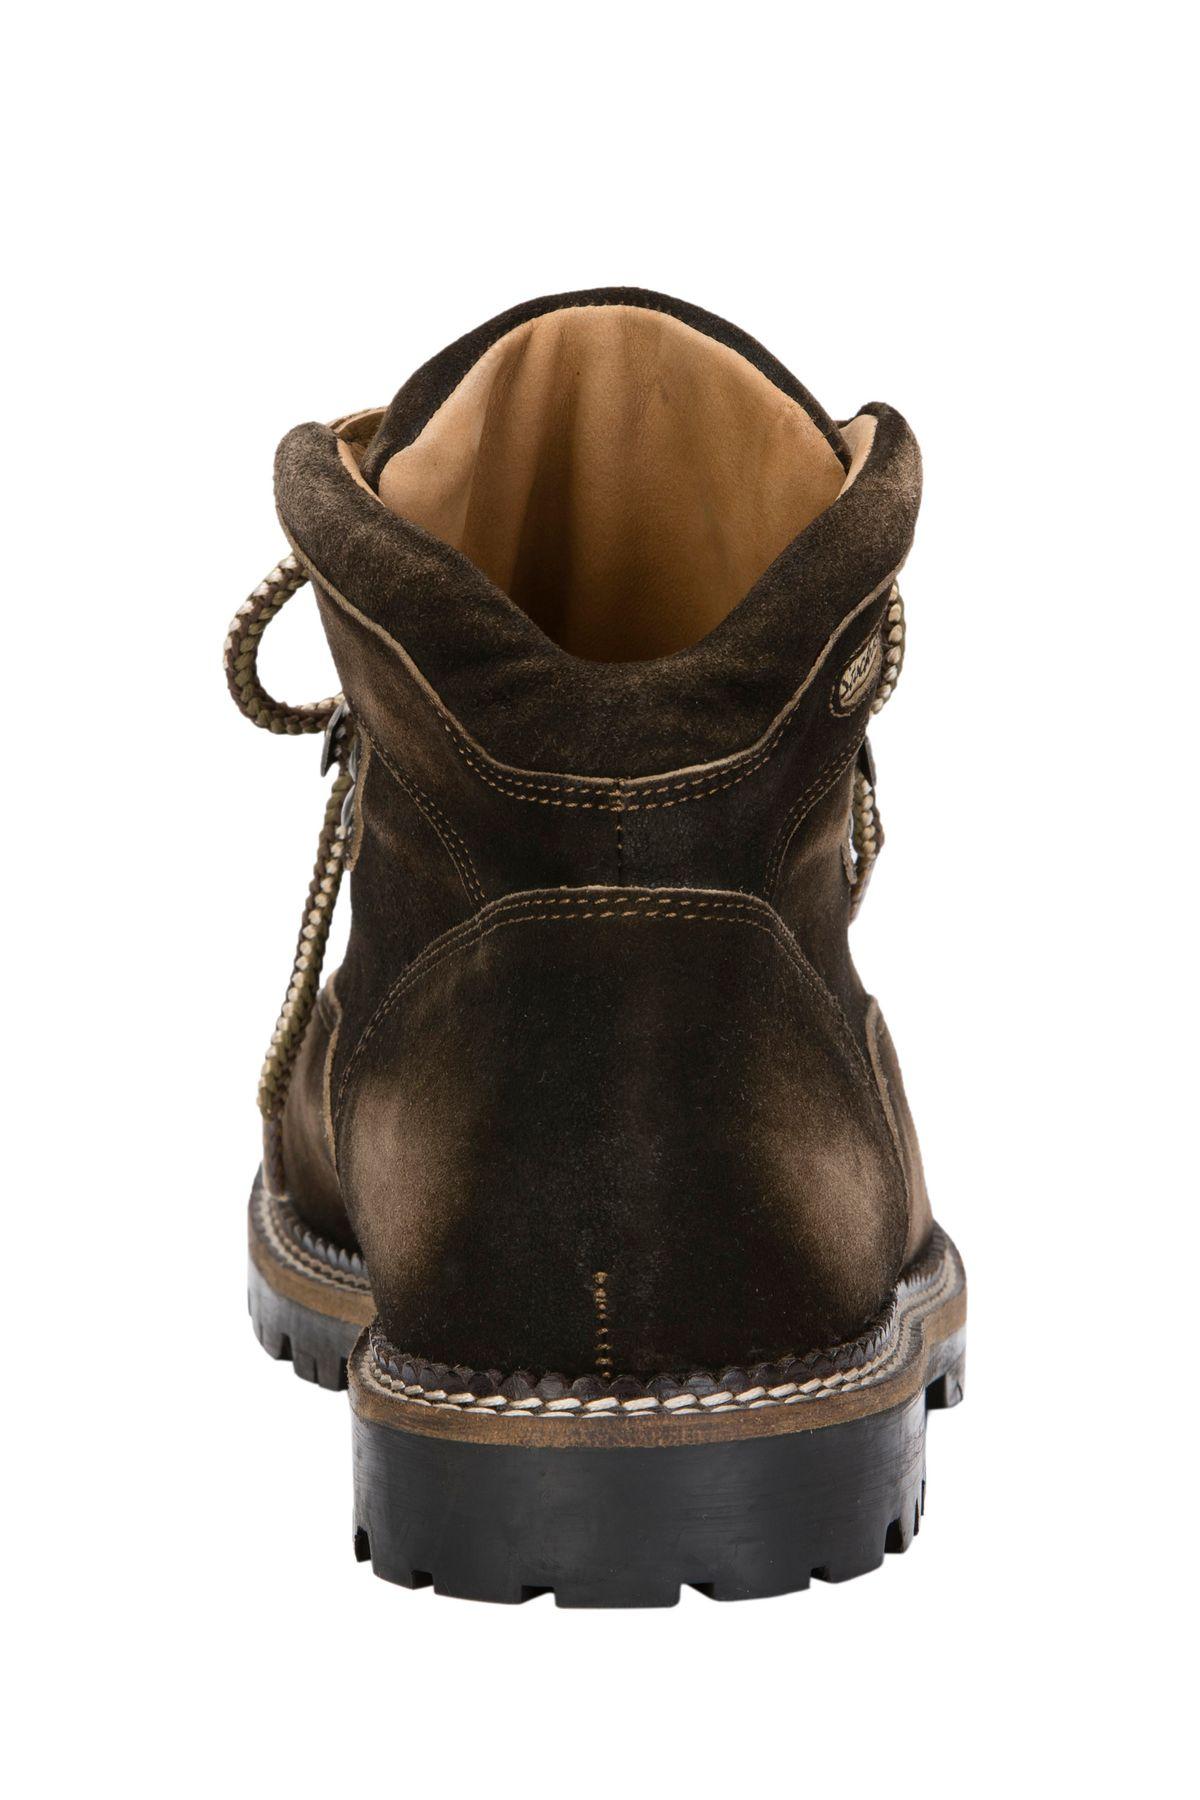 STOCKERPOINT - Herren Trachten Schuhe, 4460 – Bild 3